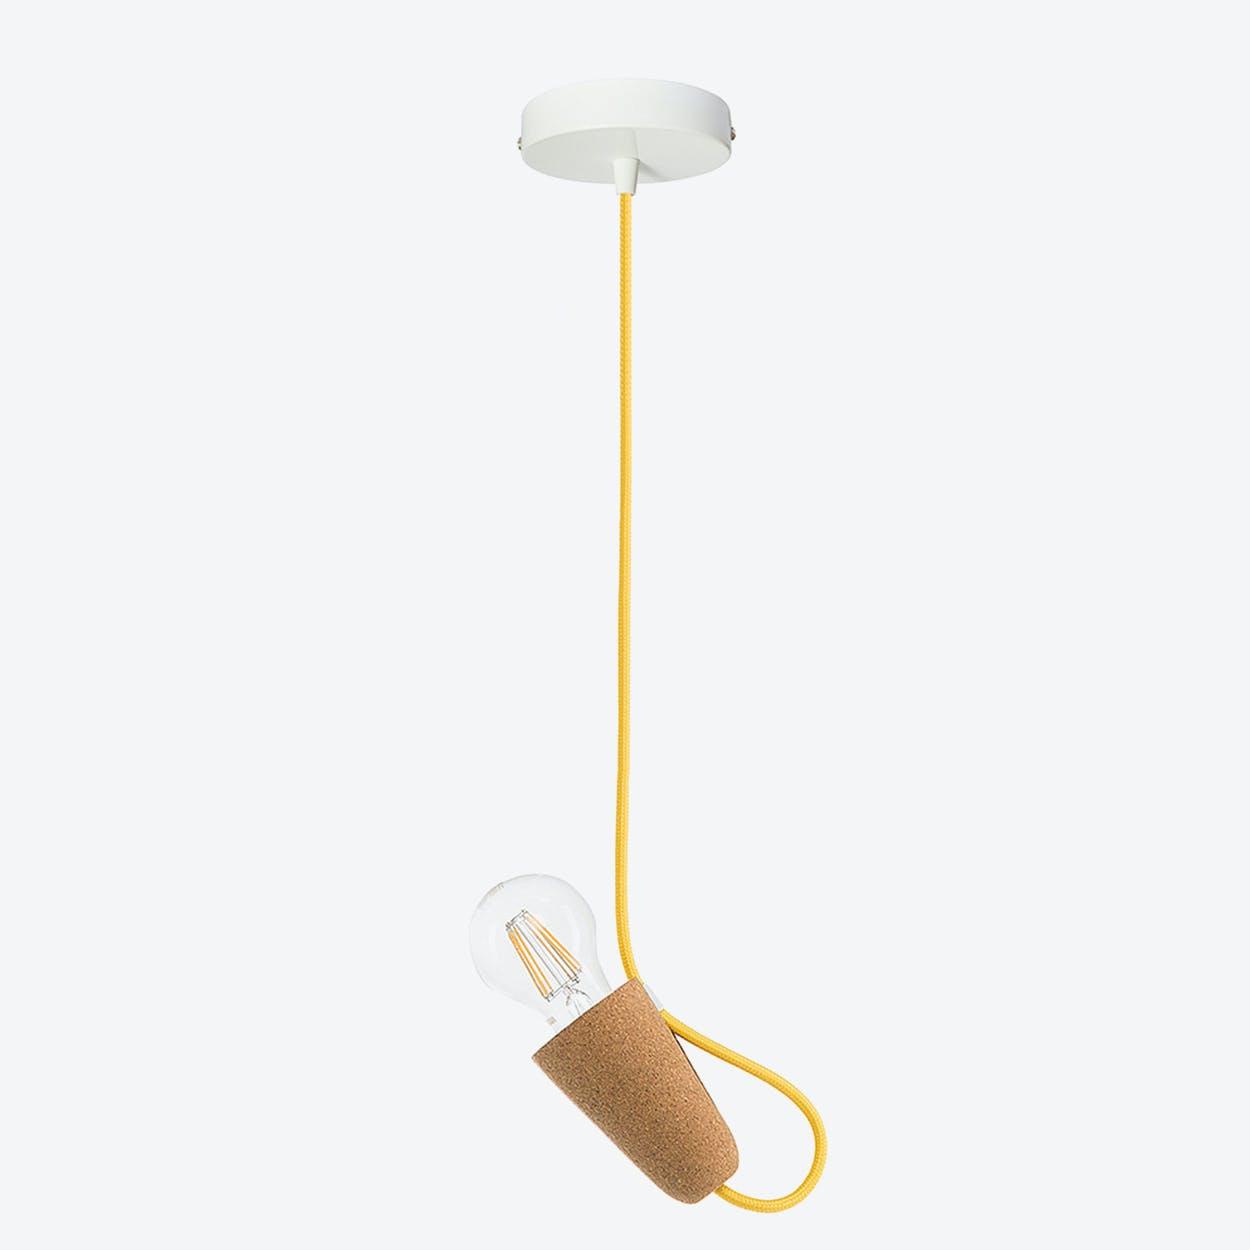 Sininho Pendant Lamp in Light Cork & Yellow